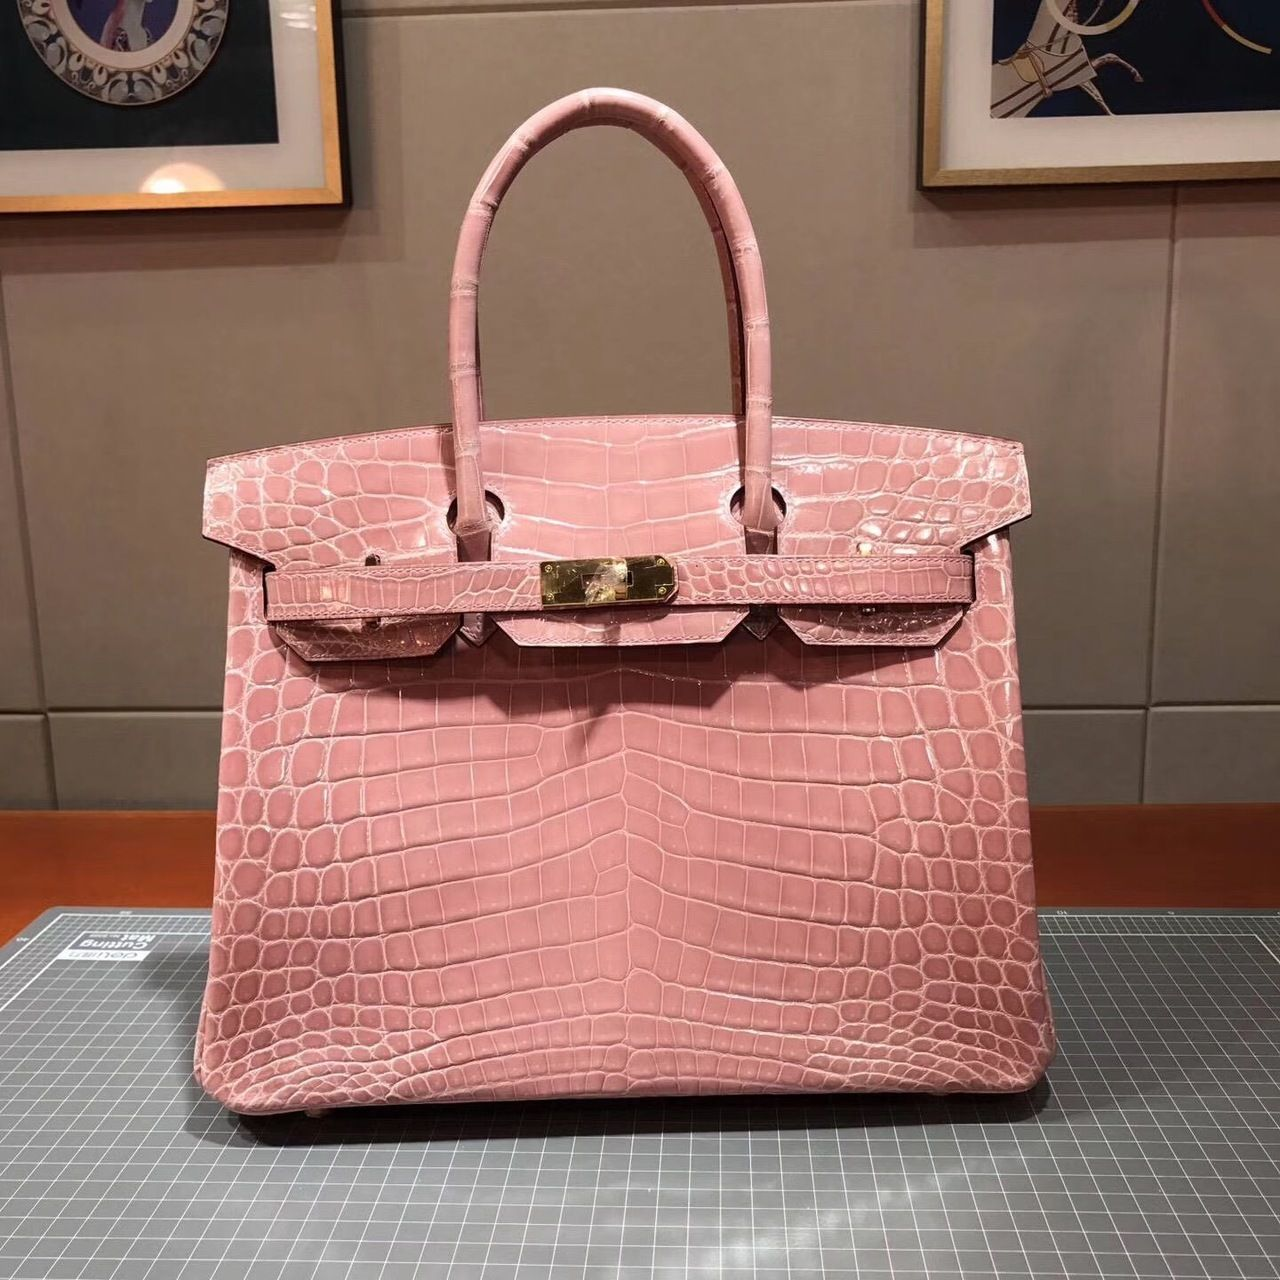 e8c91ce309 Hermes Birkin 30cm Shiny Niloticus Crocodile Skin Bag Handstitched  Palladium Hardware, Rose Sakura 3Q